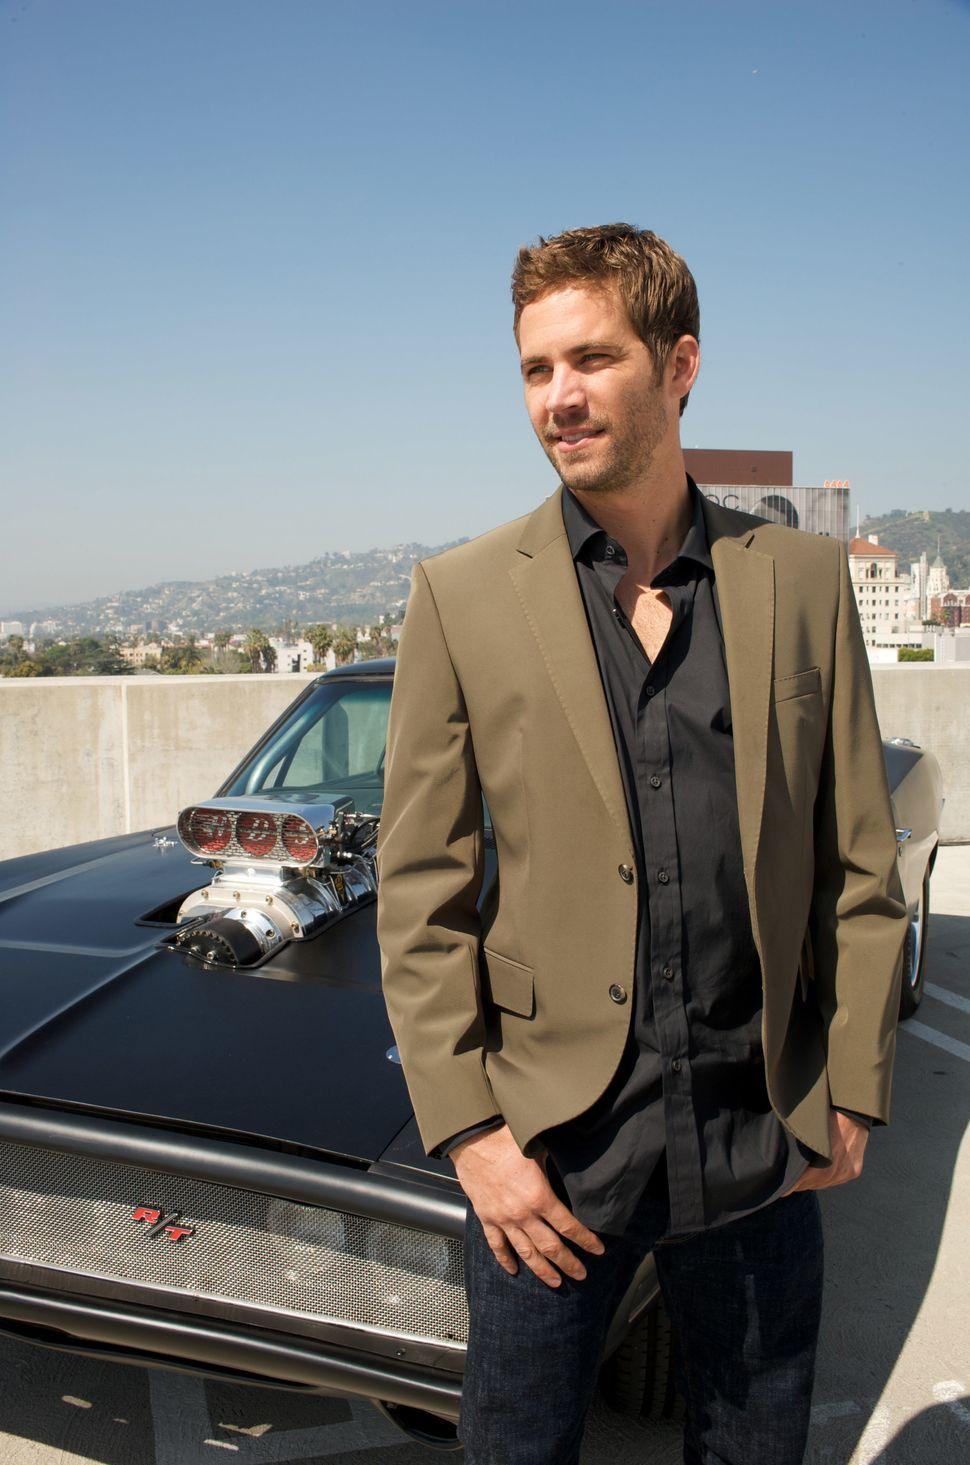 The <em>Fast & Furious </em>star died on Nov. 30 at 40.